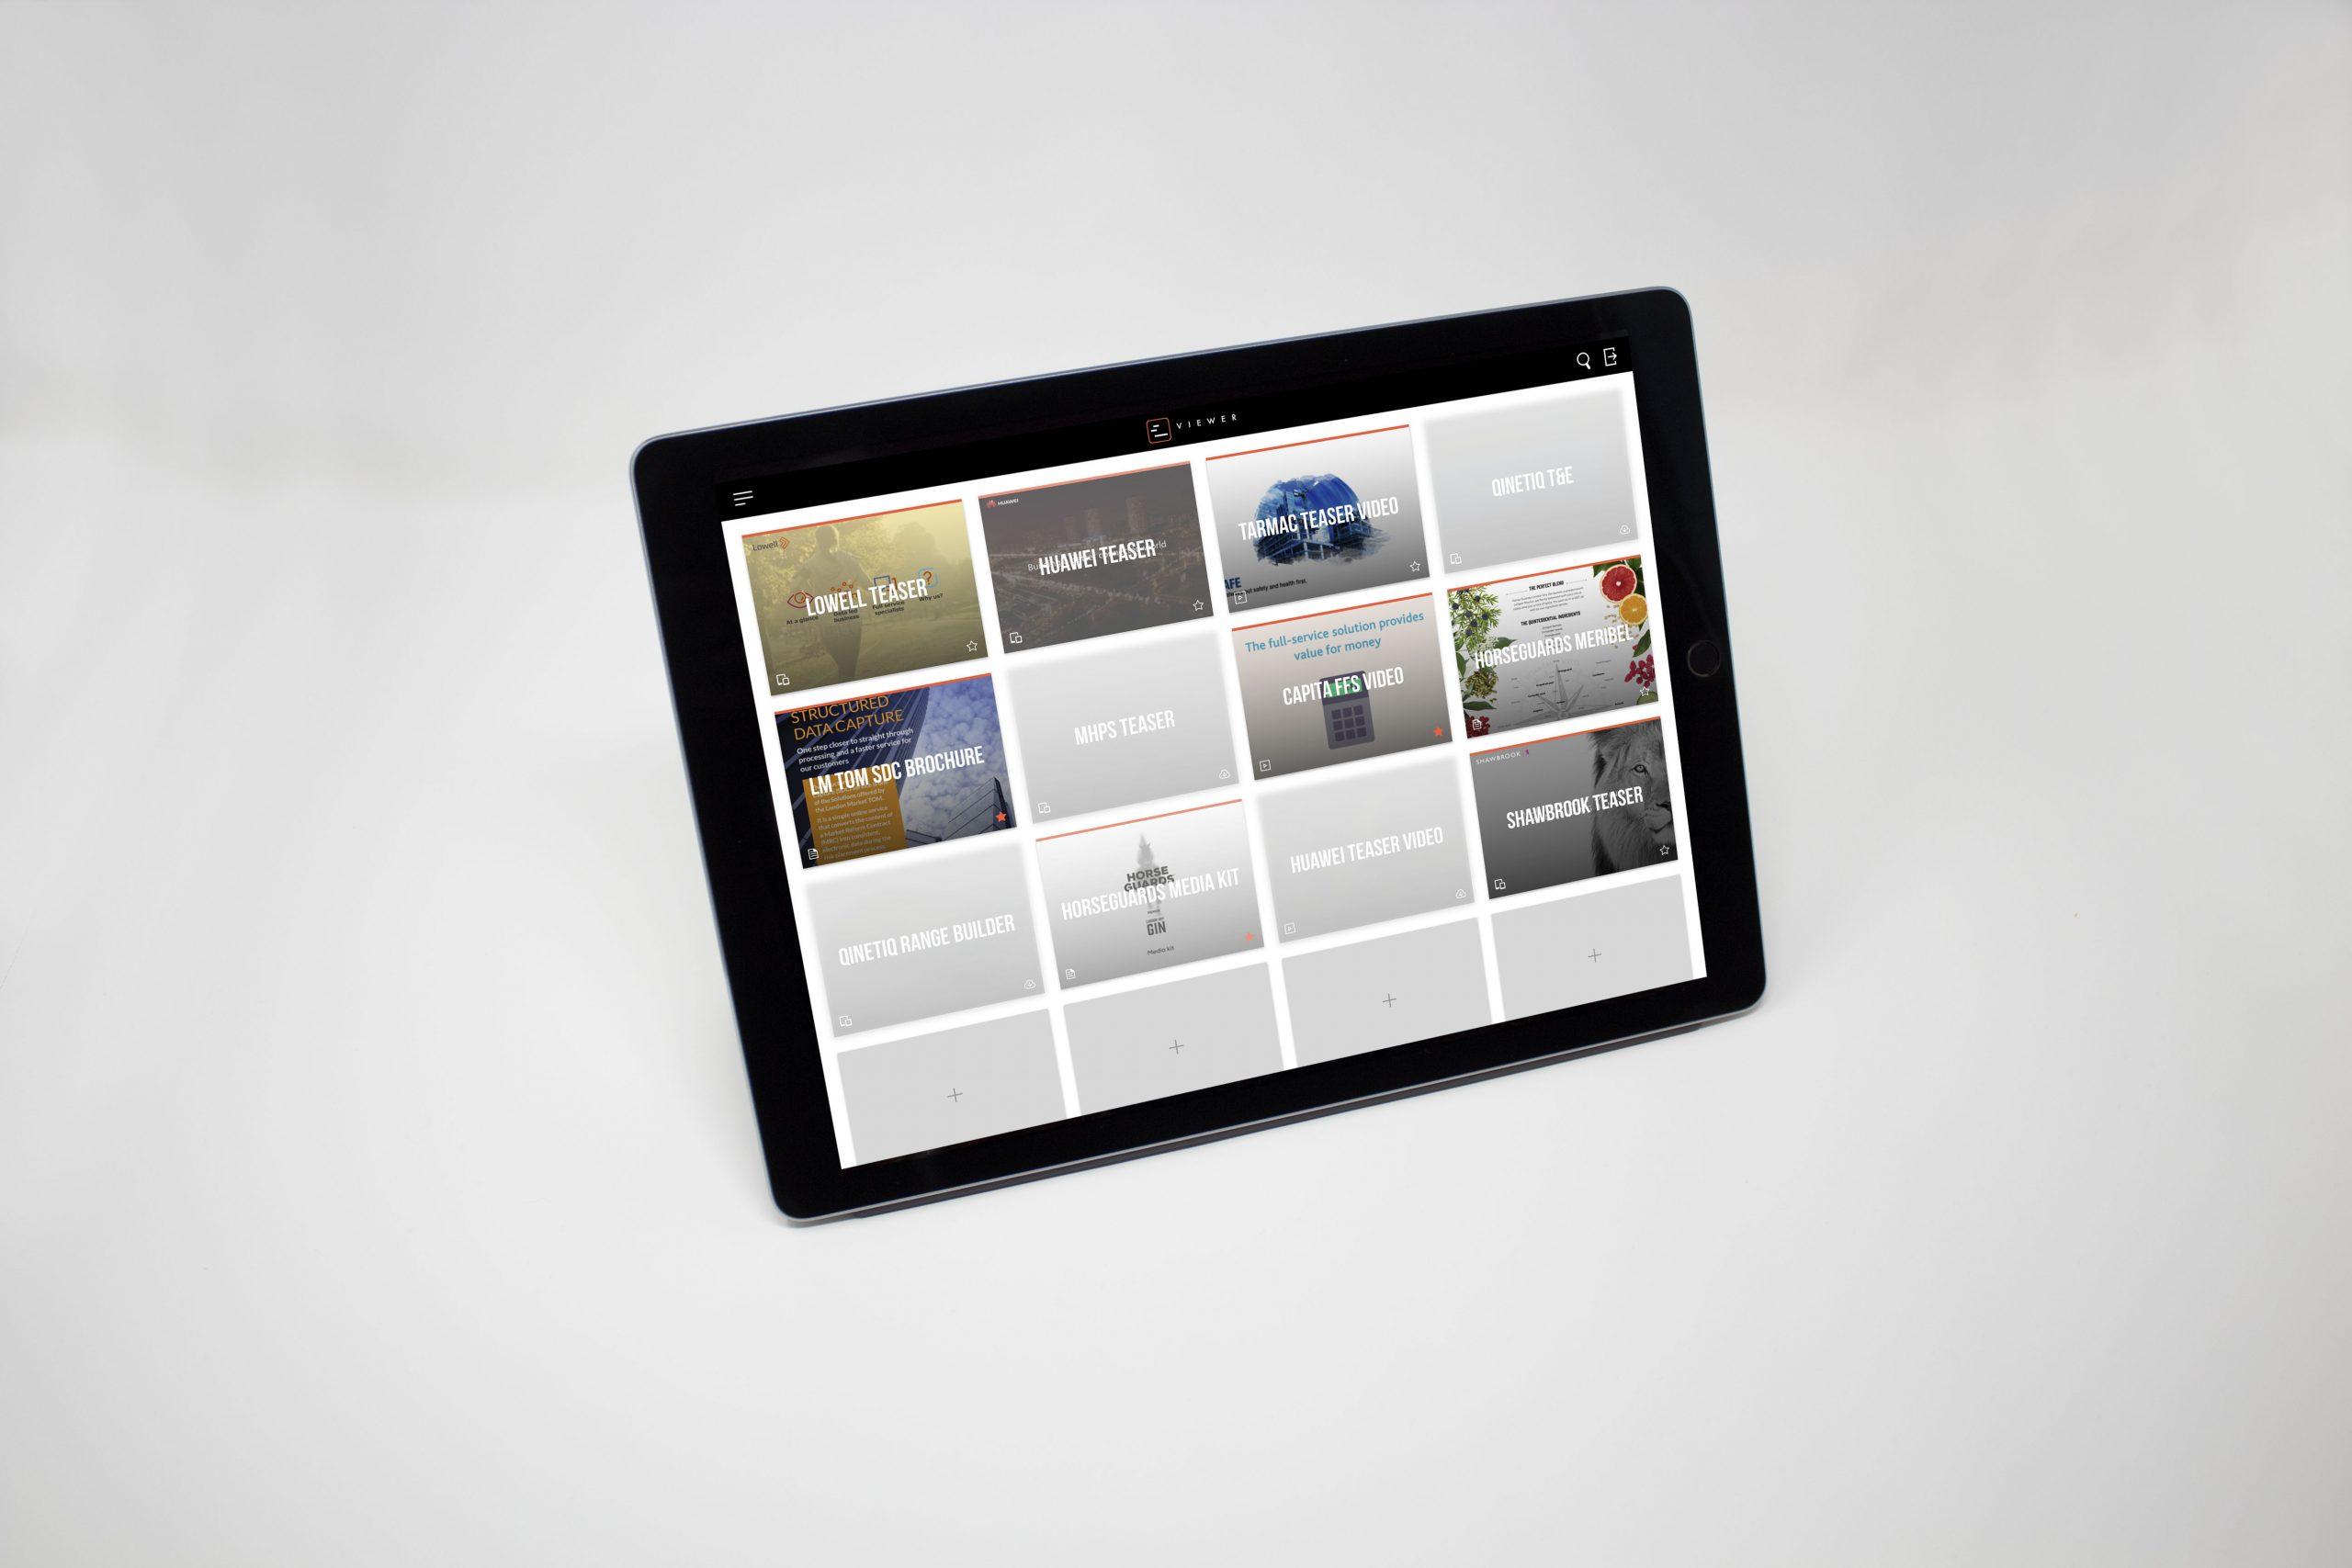 OB_Wave-Viewer-on-iPad